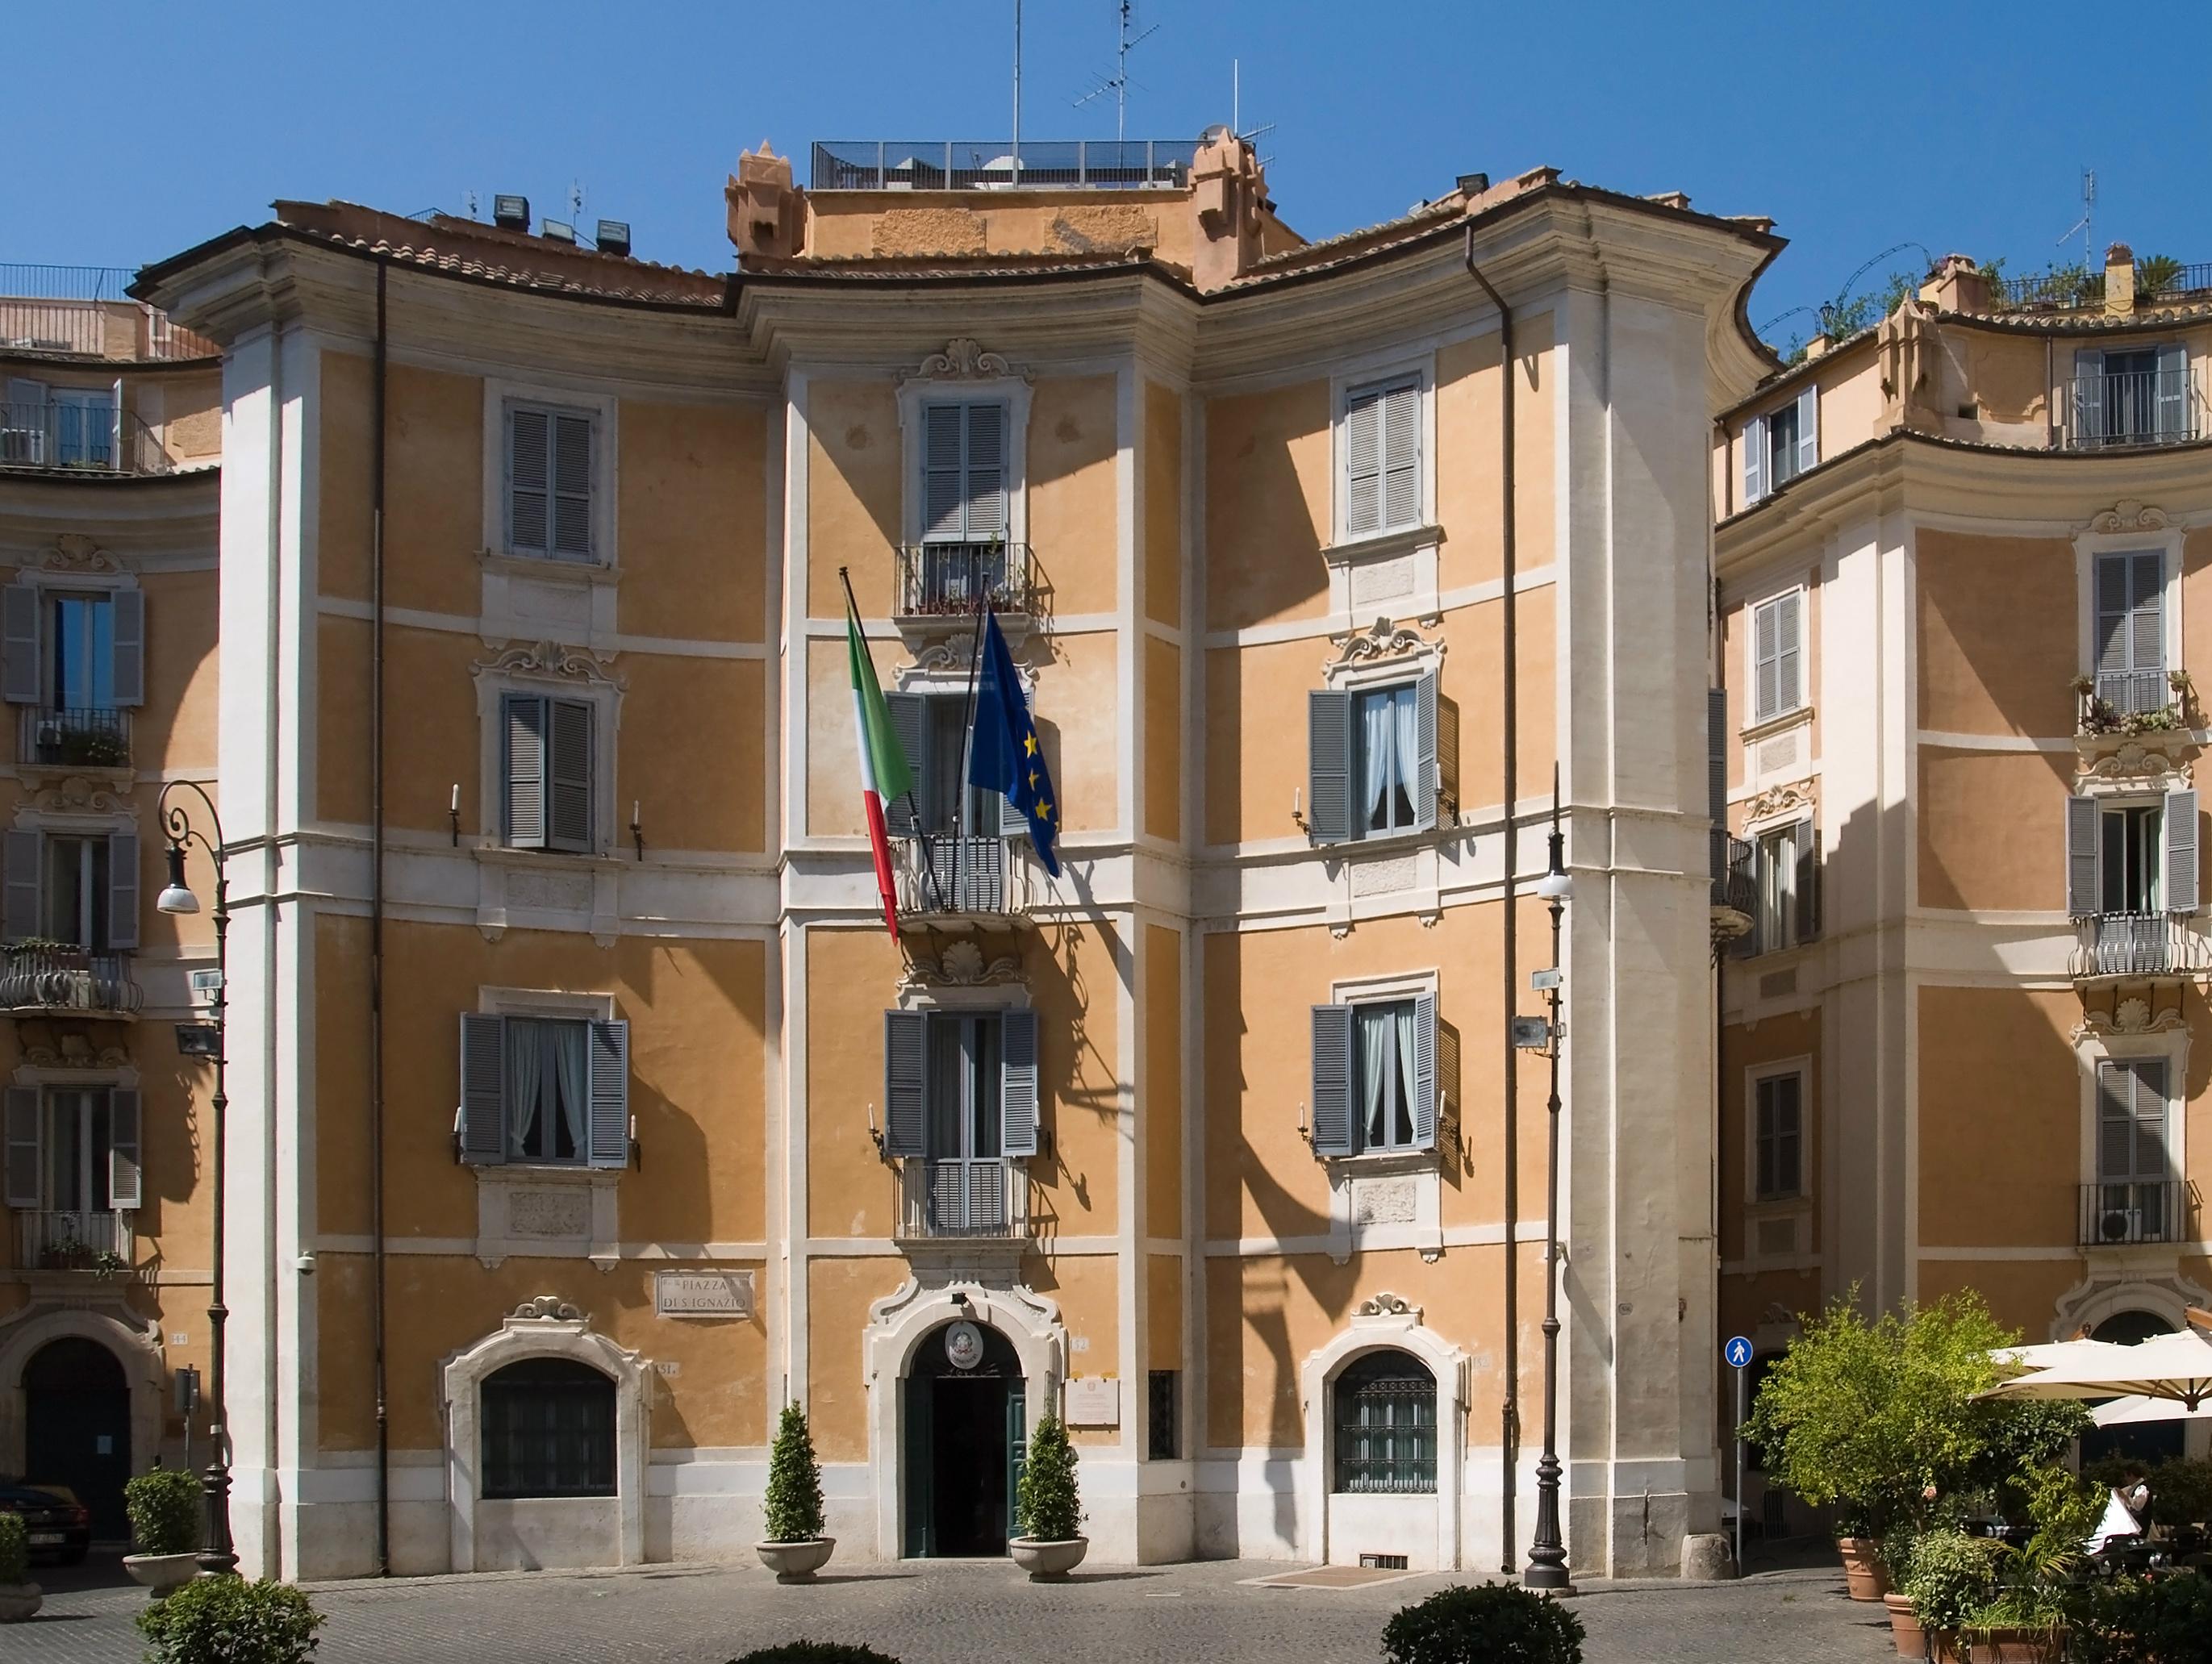 Palazzo Sant'Ignazio